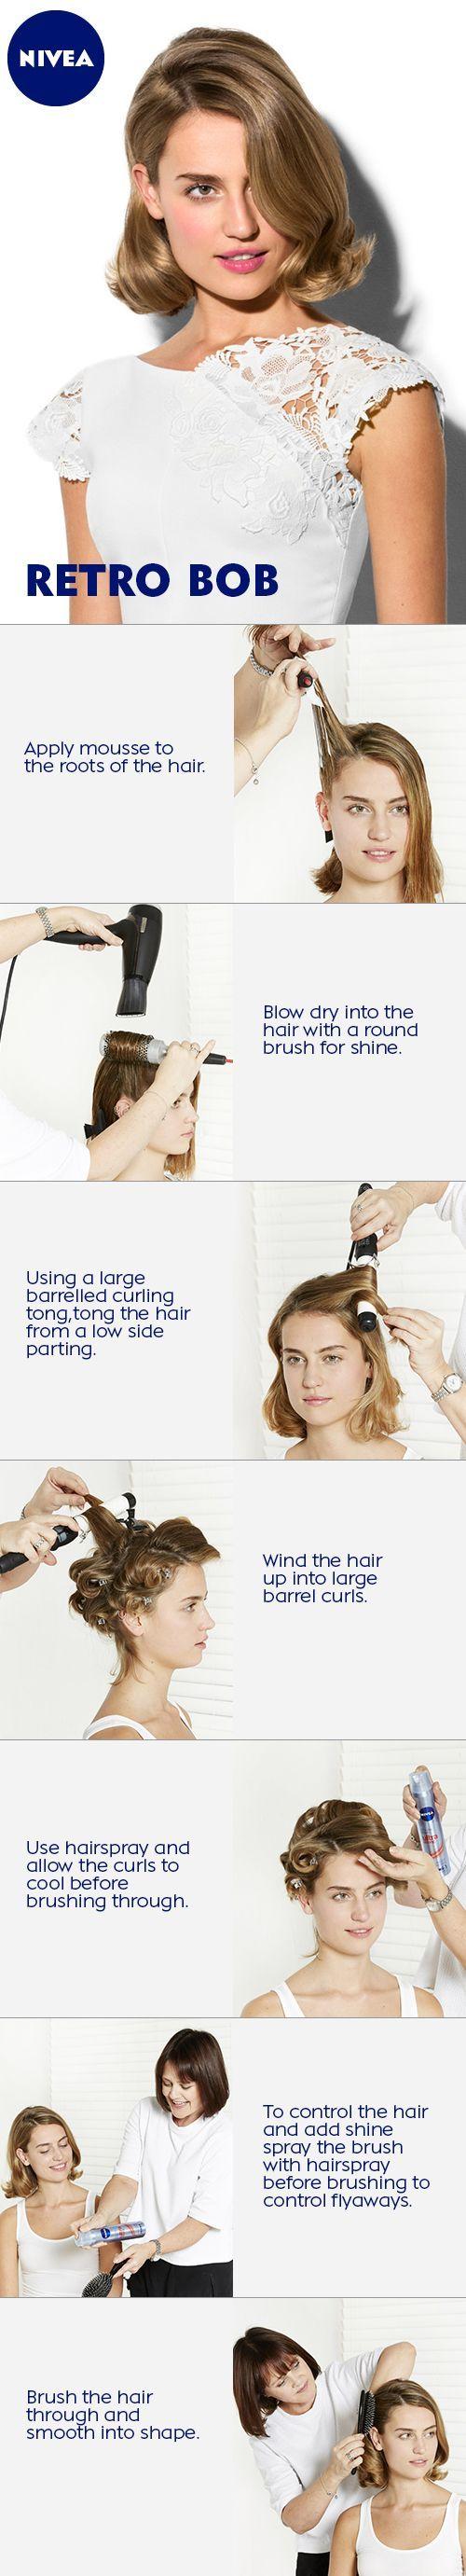 "This is how you make the elegant ""Retro Bob""! Have fun! #Hair #Hairstyle #Tutorial #DIY #Retro #Bob"